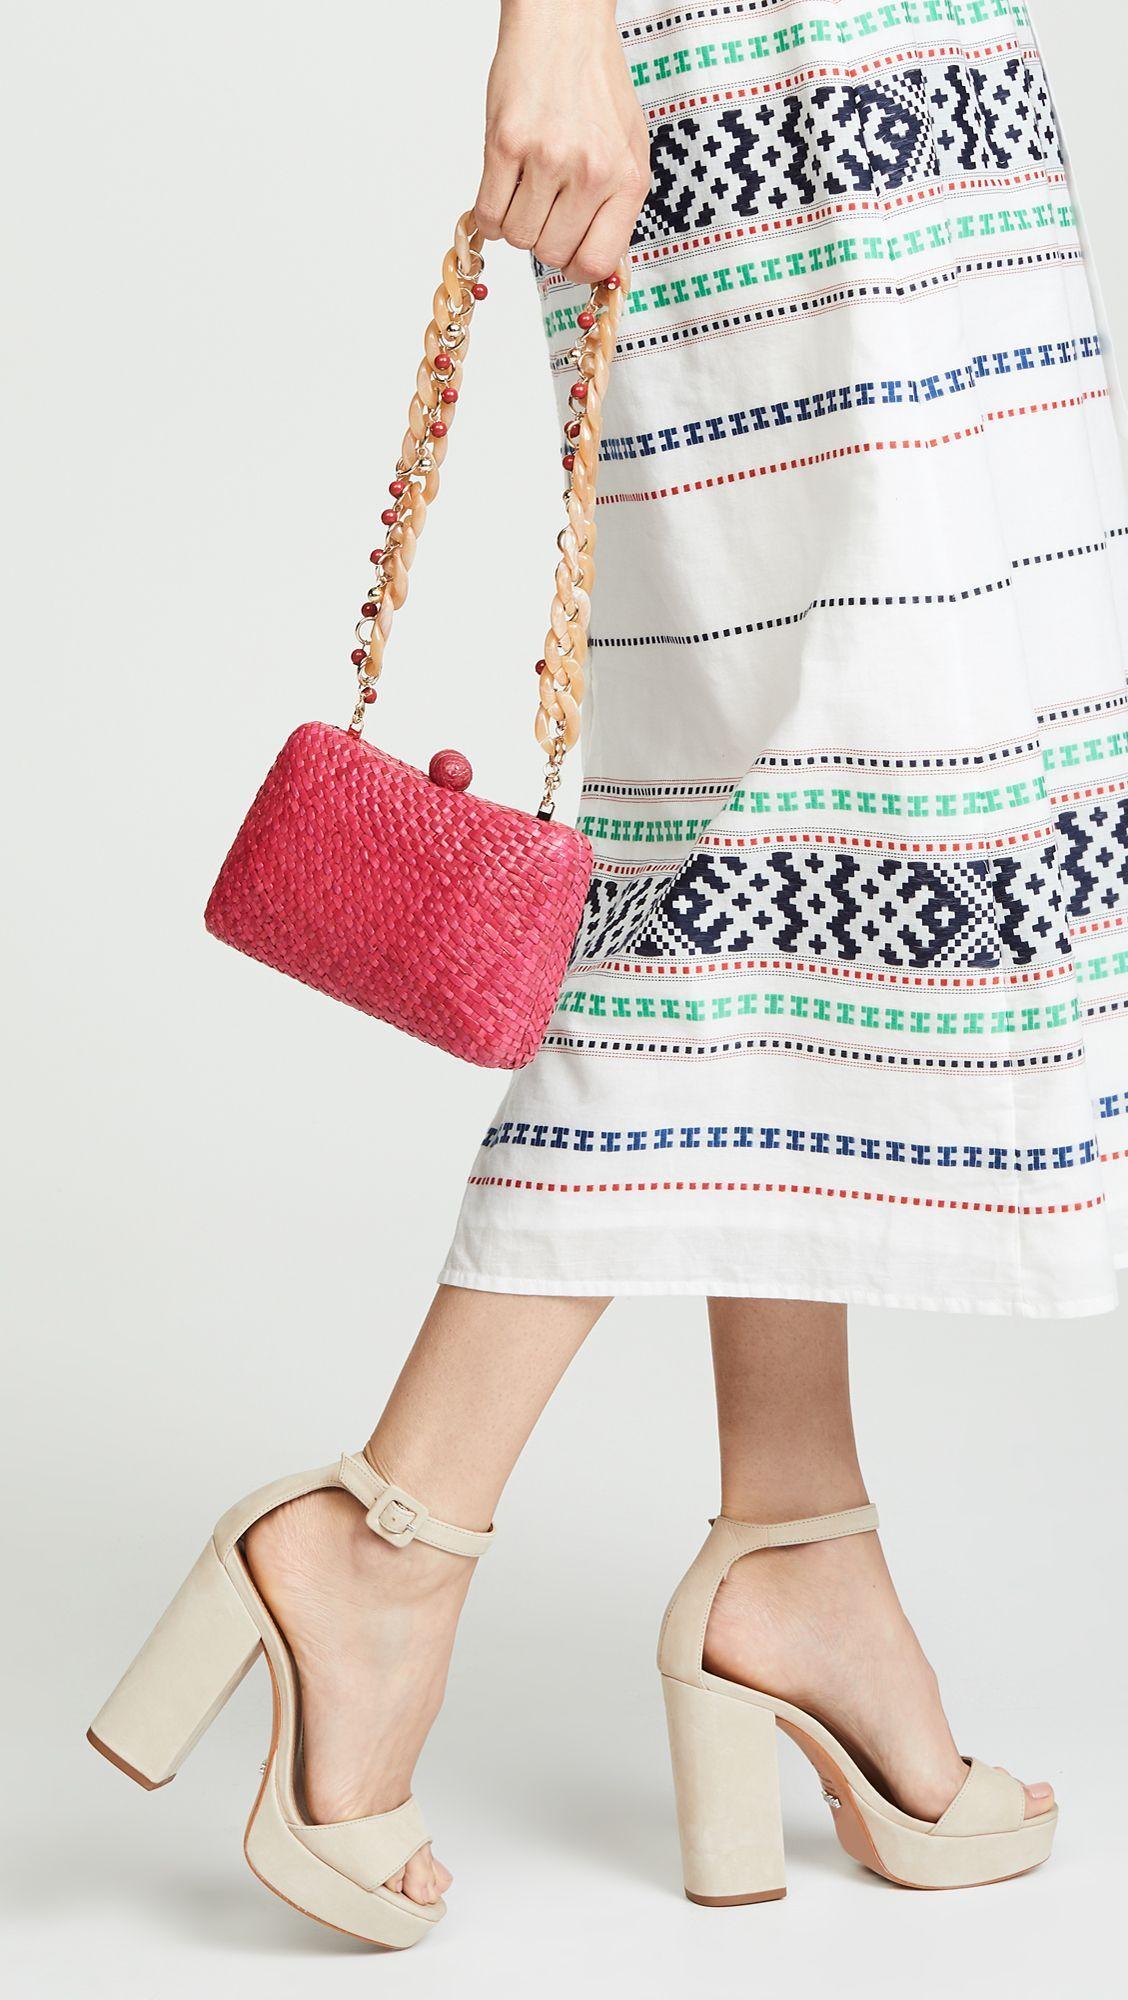 23 Fancy Handbags To Complete Your Wedding Guest Look Refinery29 S